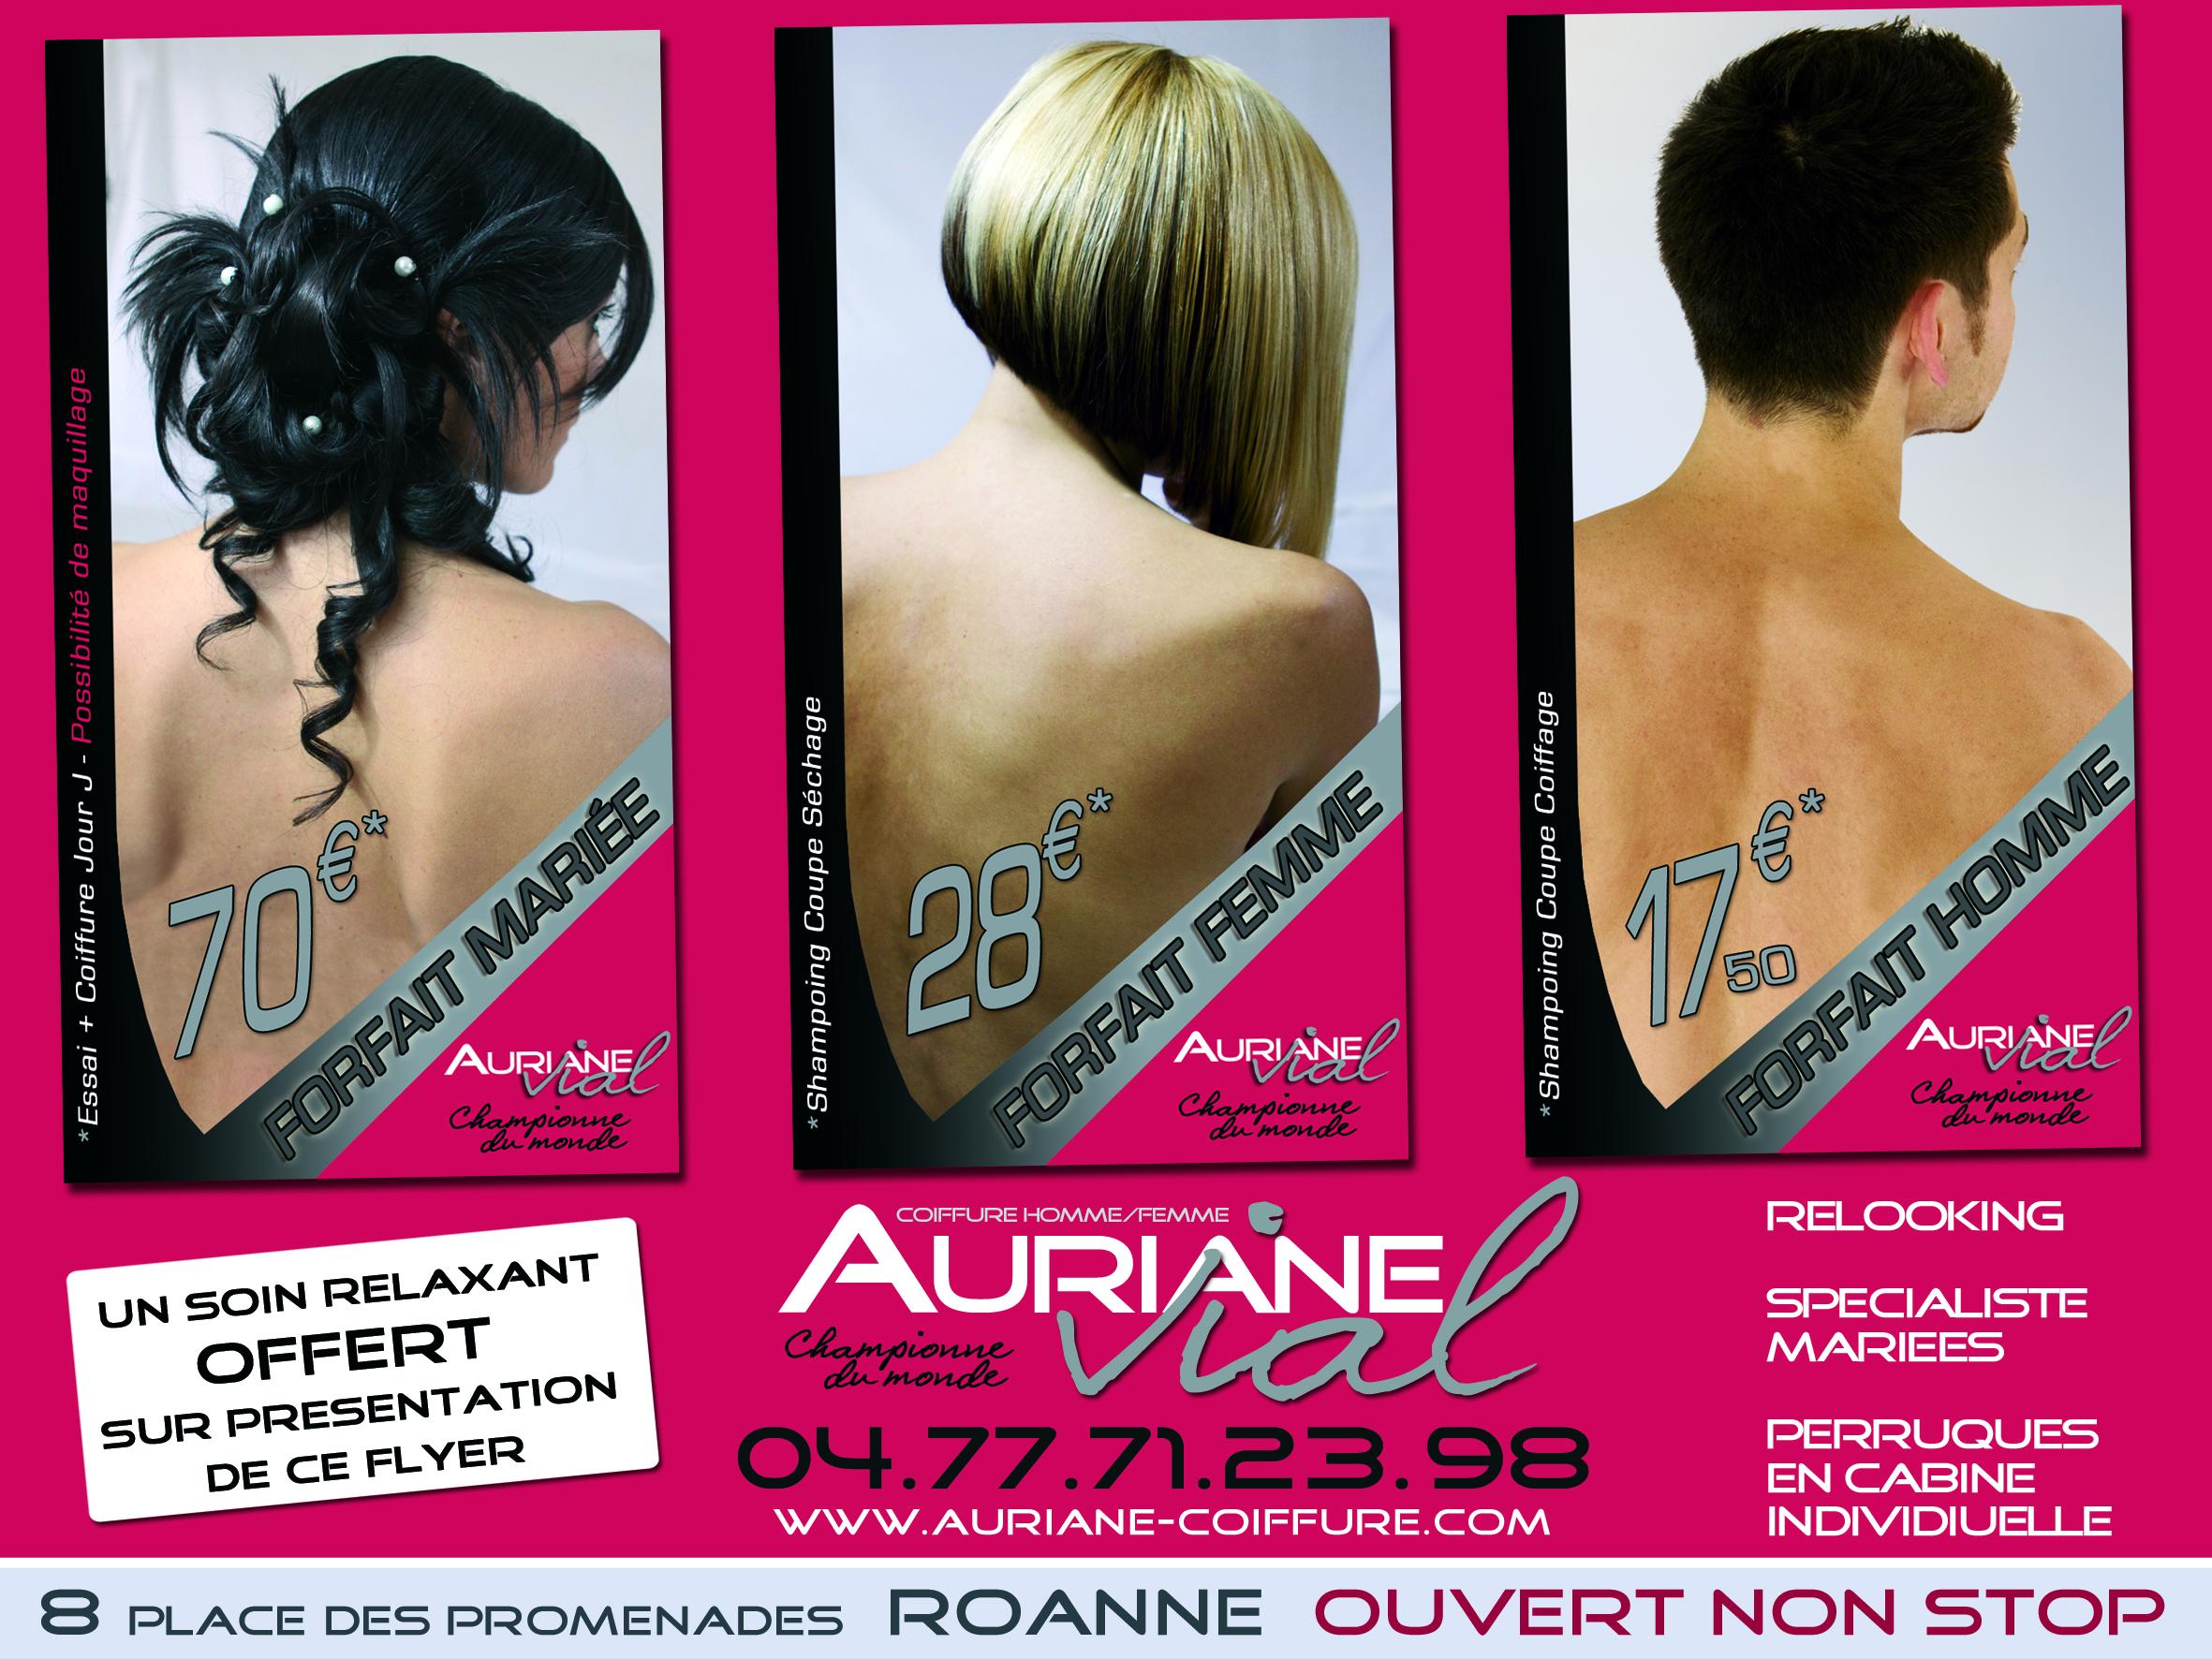 Vial Auriane Roanne